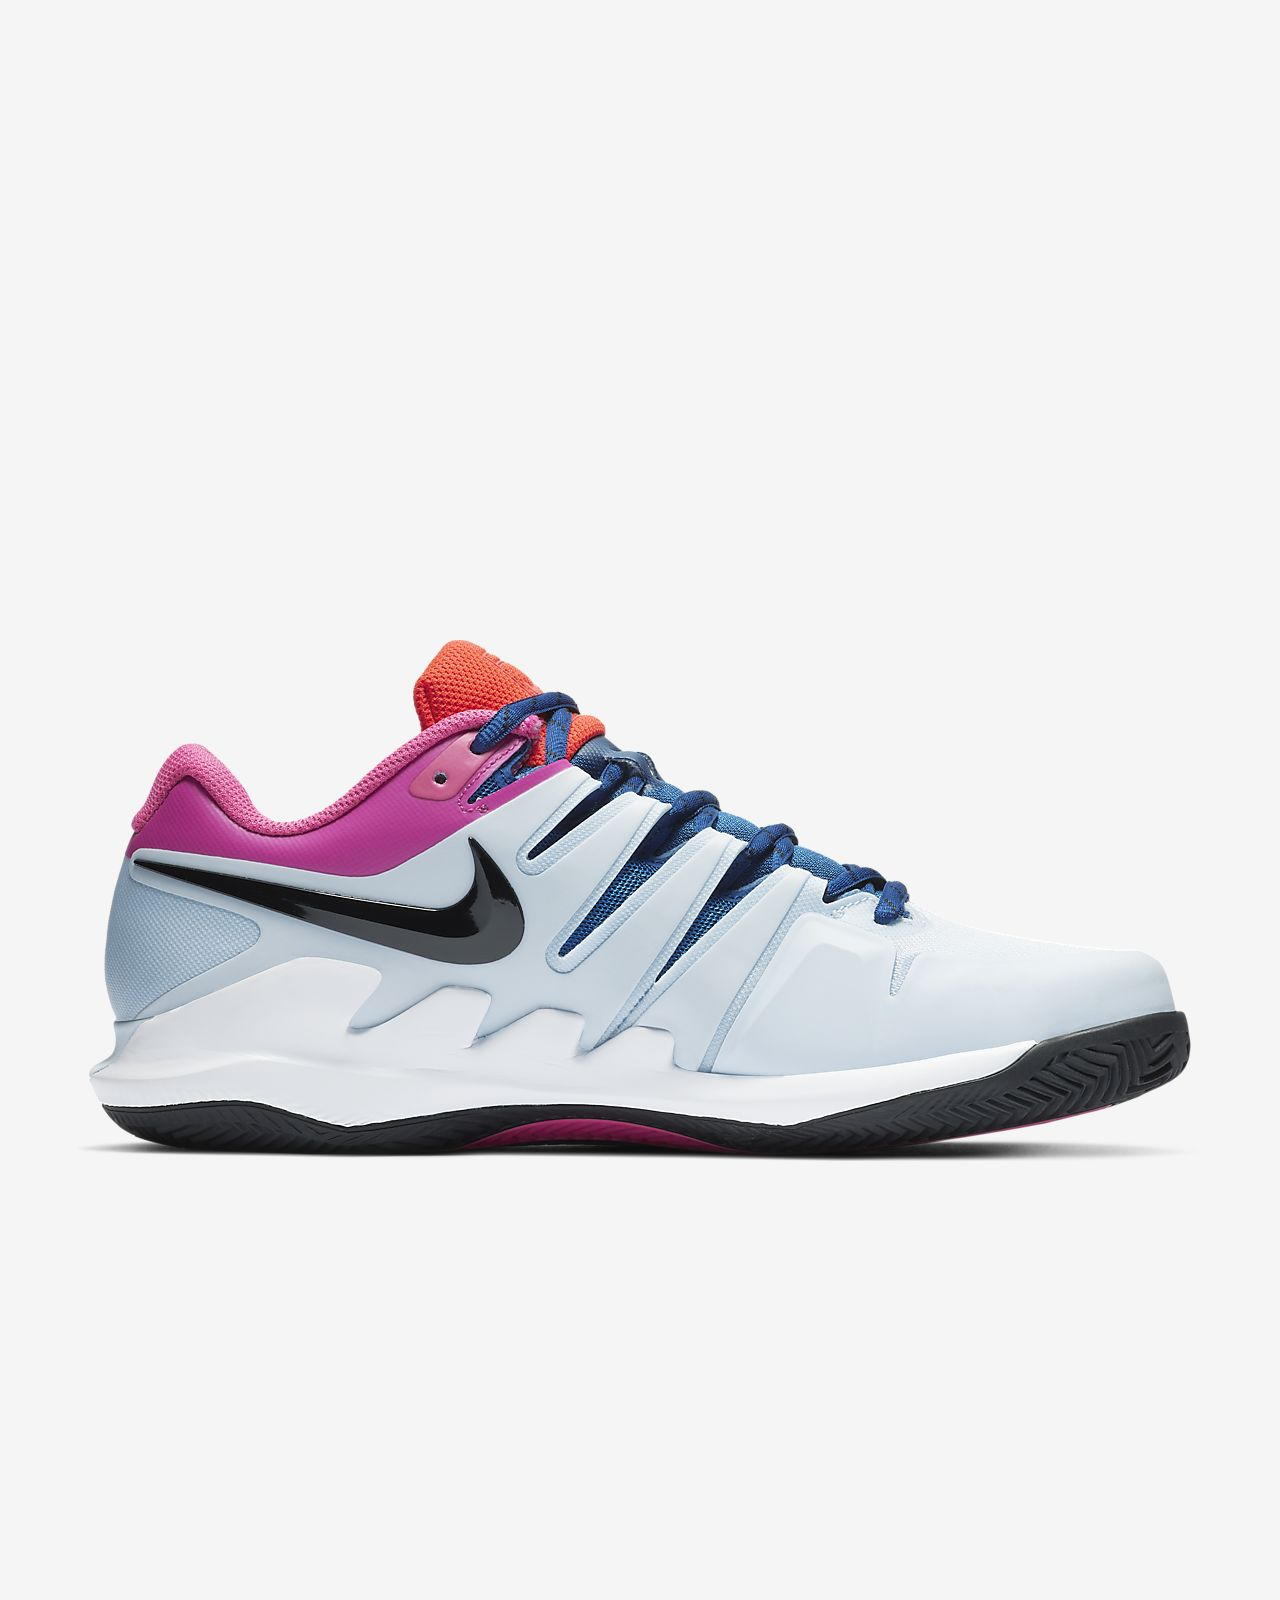 separation shoes 77745 66dc2 ... Nike Air Zoom Vapor X Clay Men s Tennis Shoe